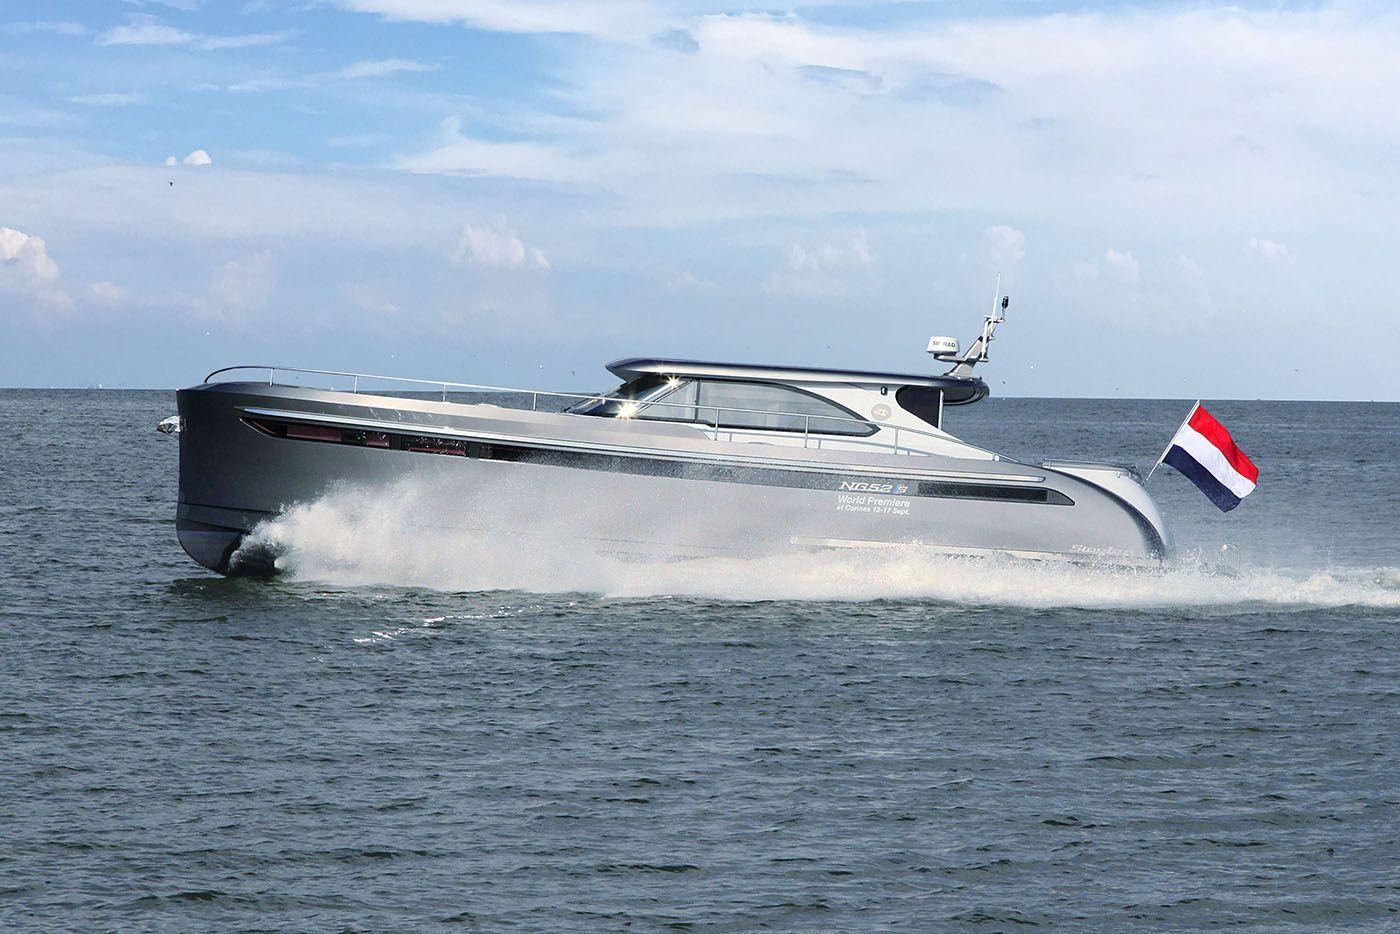 Steeler Yachts - Models - Steeler ng 52 s offshore   Boats   Boat